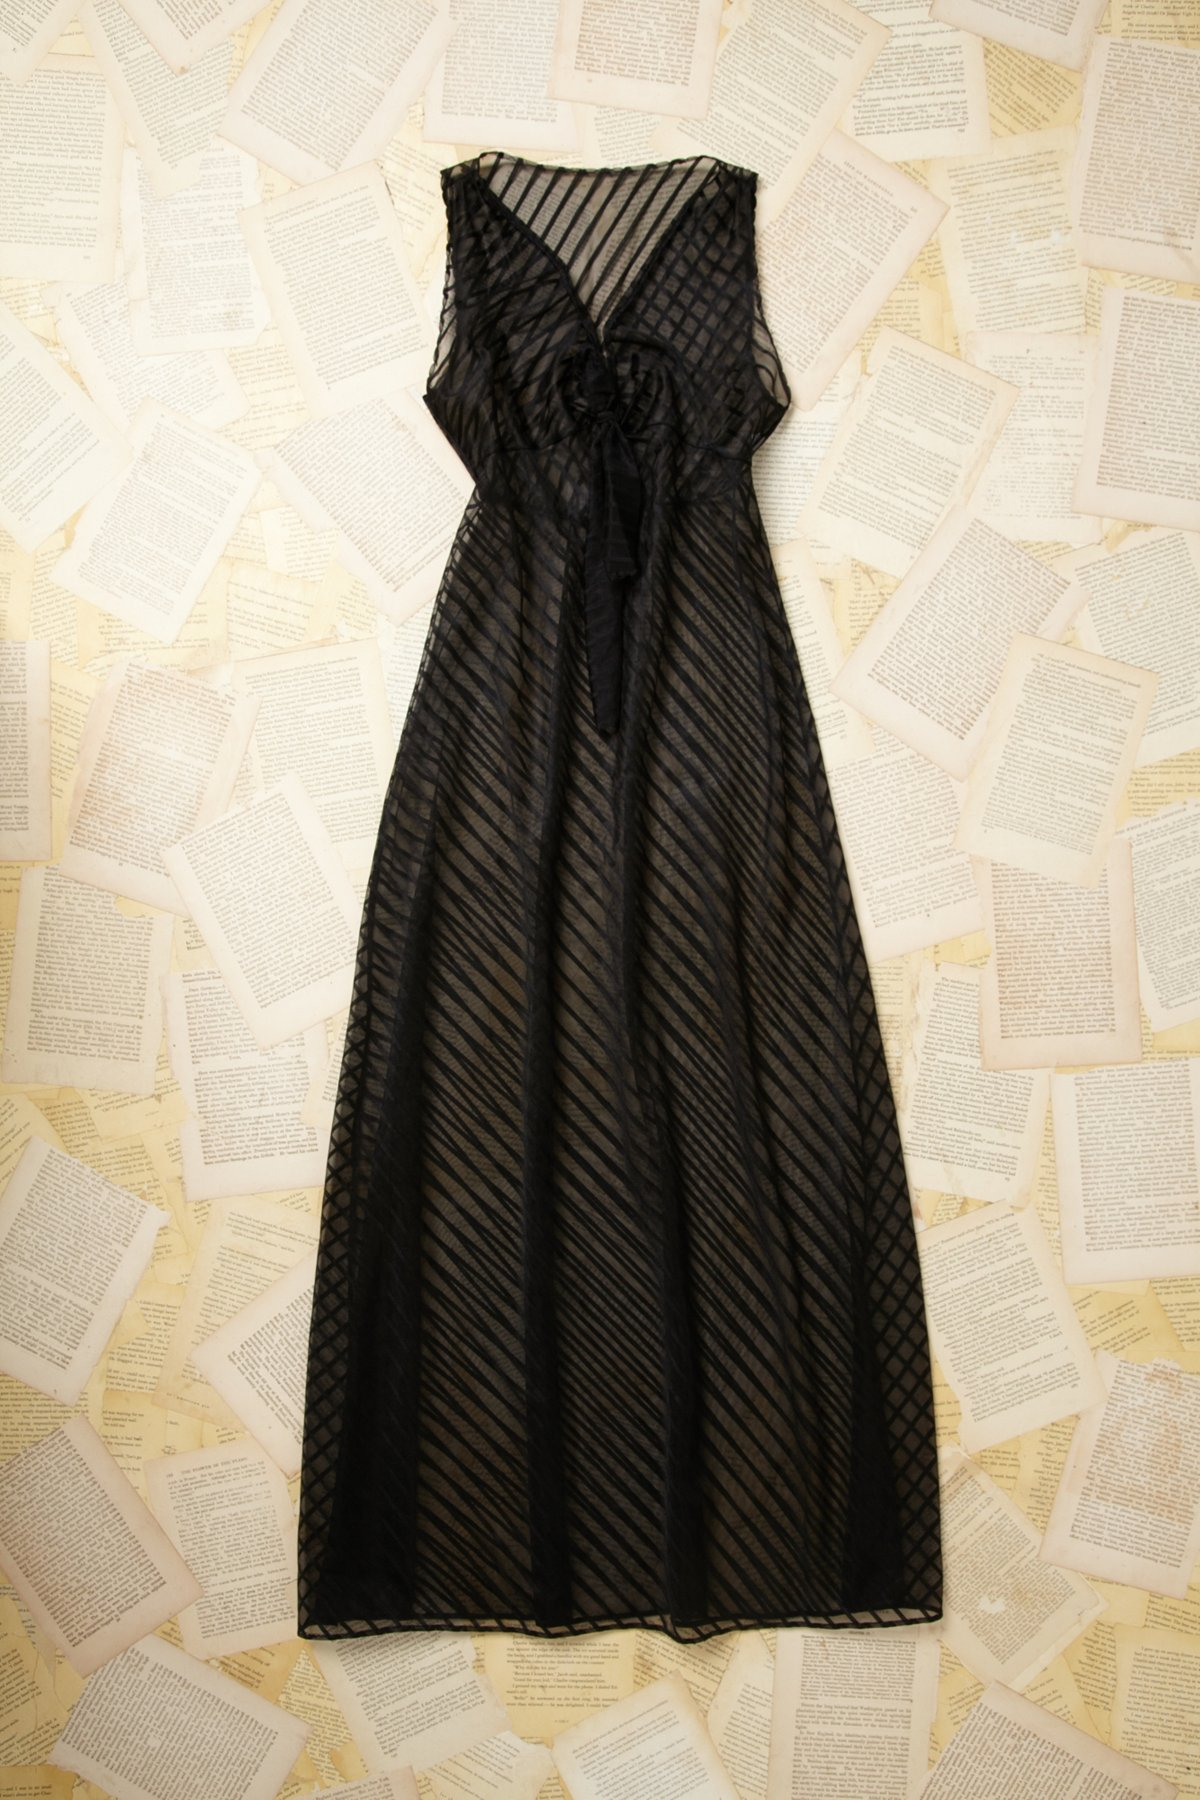 Vintage Sheer Night Dress